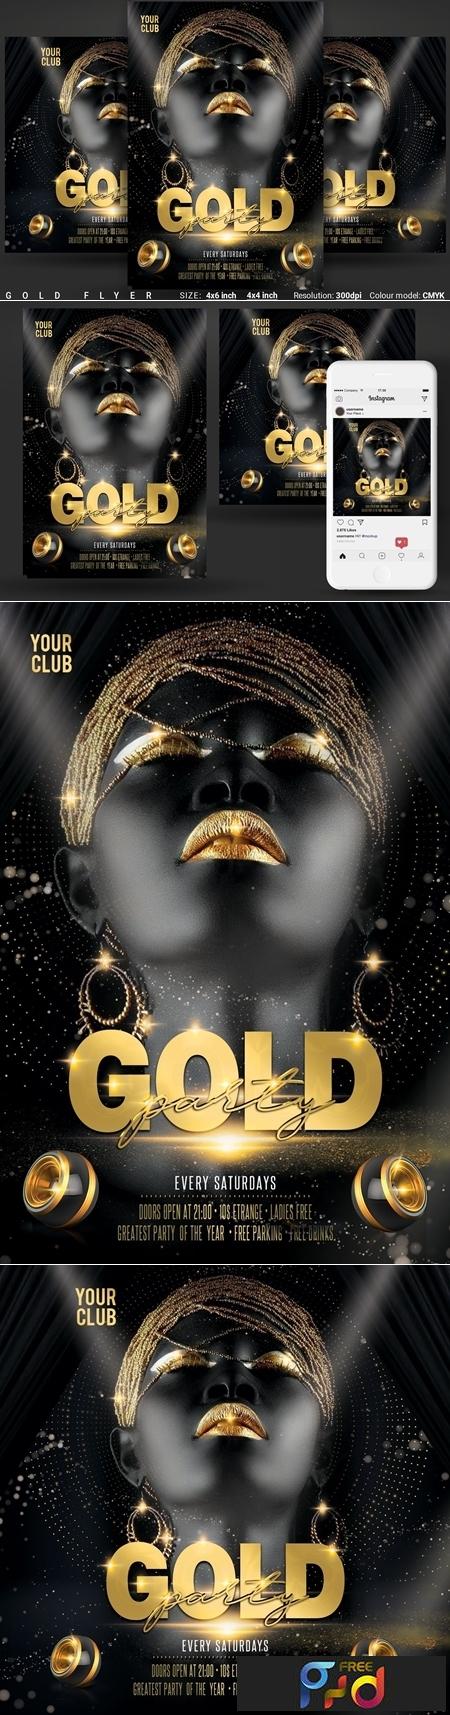 Gold Flyer 3725643 1